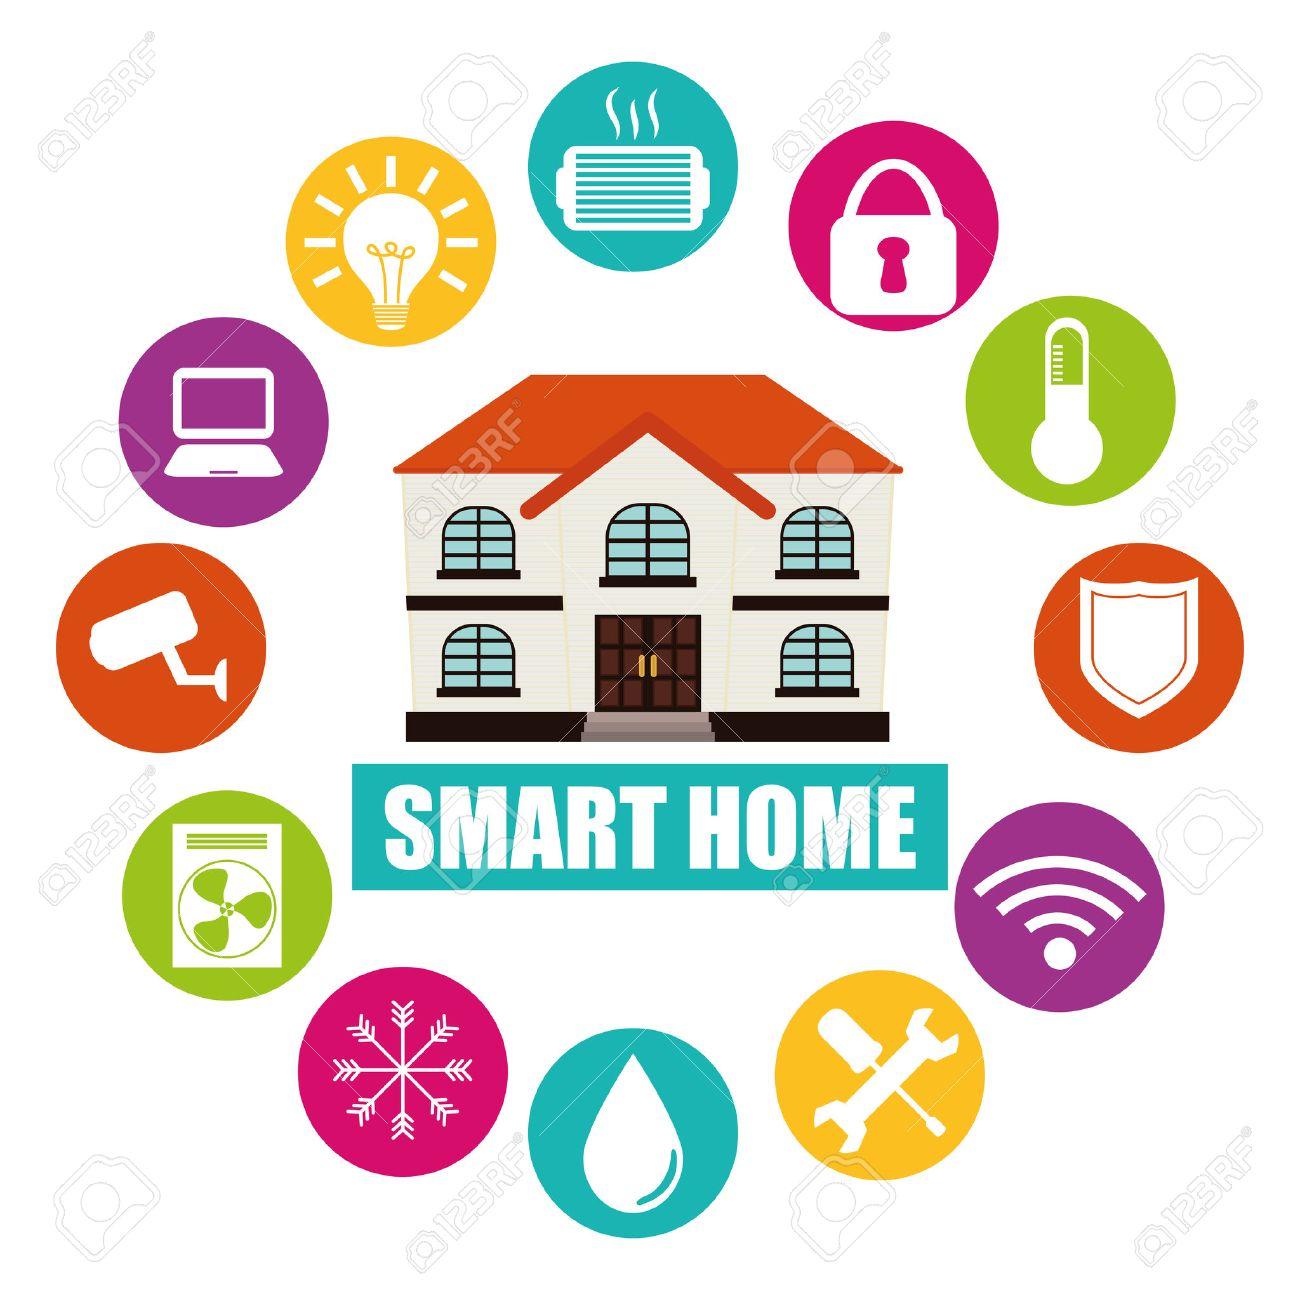 Smart Home Design, Vector Illustration Eps10 Graphic Stock.